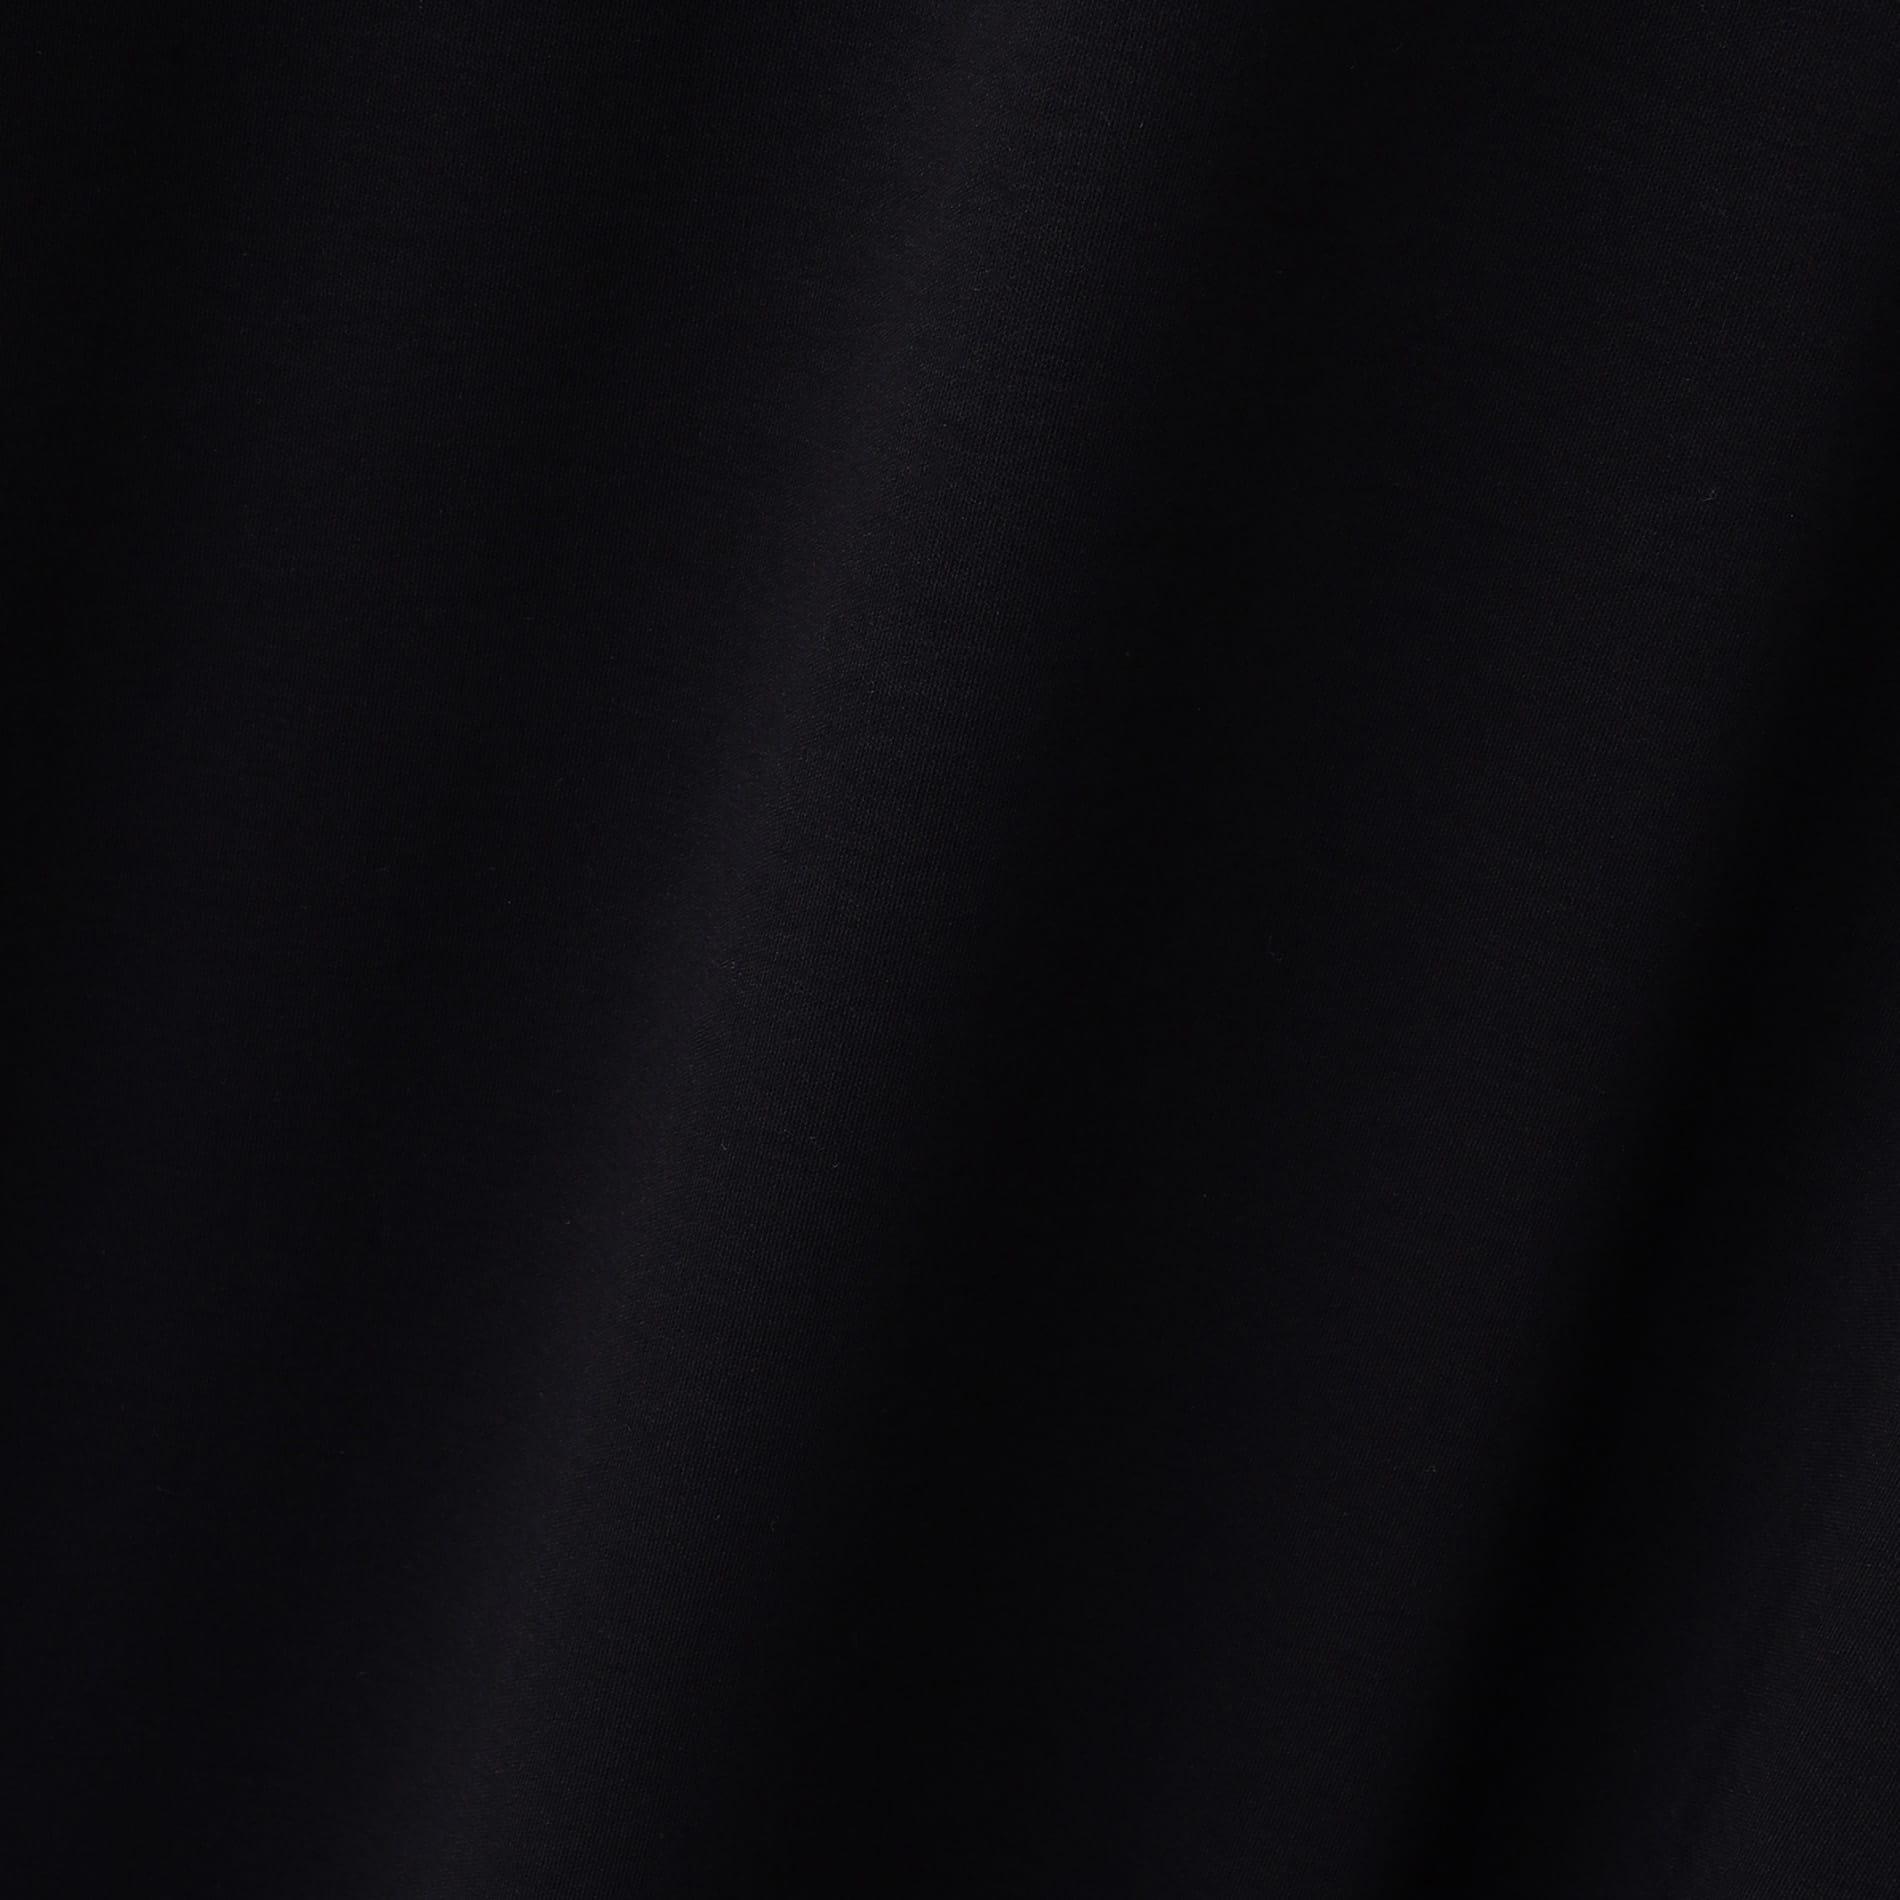 【JOHN LAWRENCE SULLIVAN】WOMEN CHAOS UP SIDE DOWN TOP 5C012-0721-29 W-26